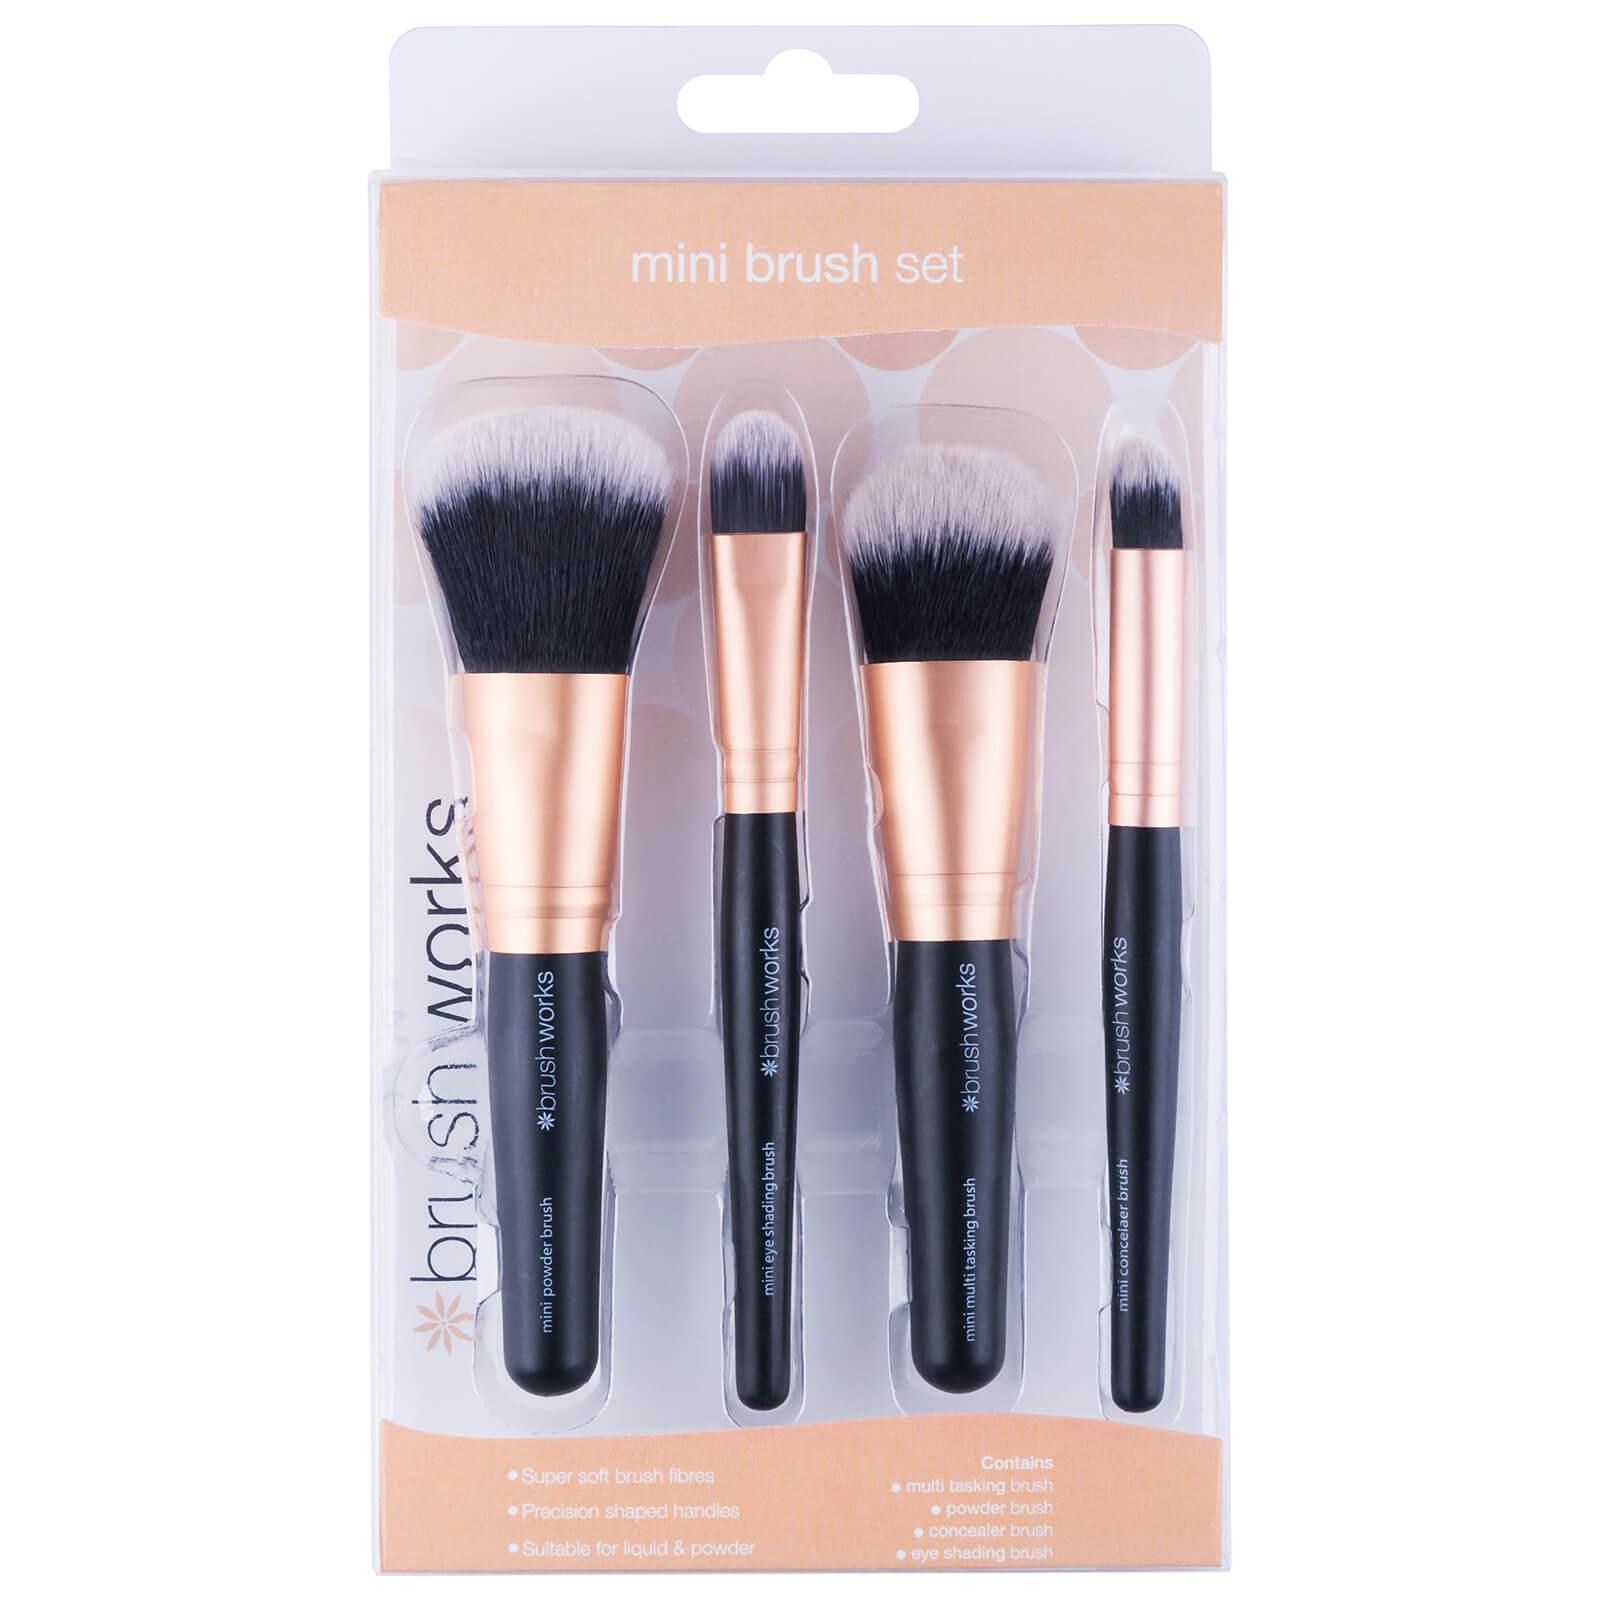 Brushworks Mini Brush Set Free Shipping Lookfantastic Eco Tools 1600 Full Powder Description